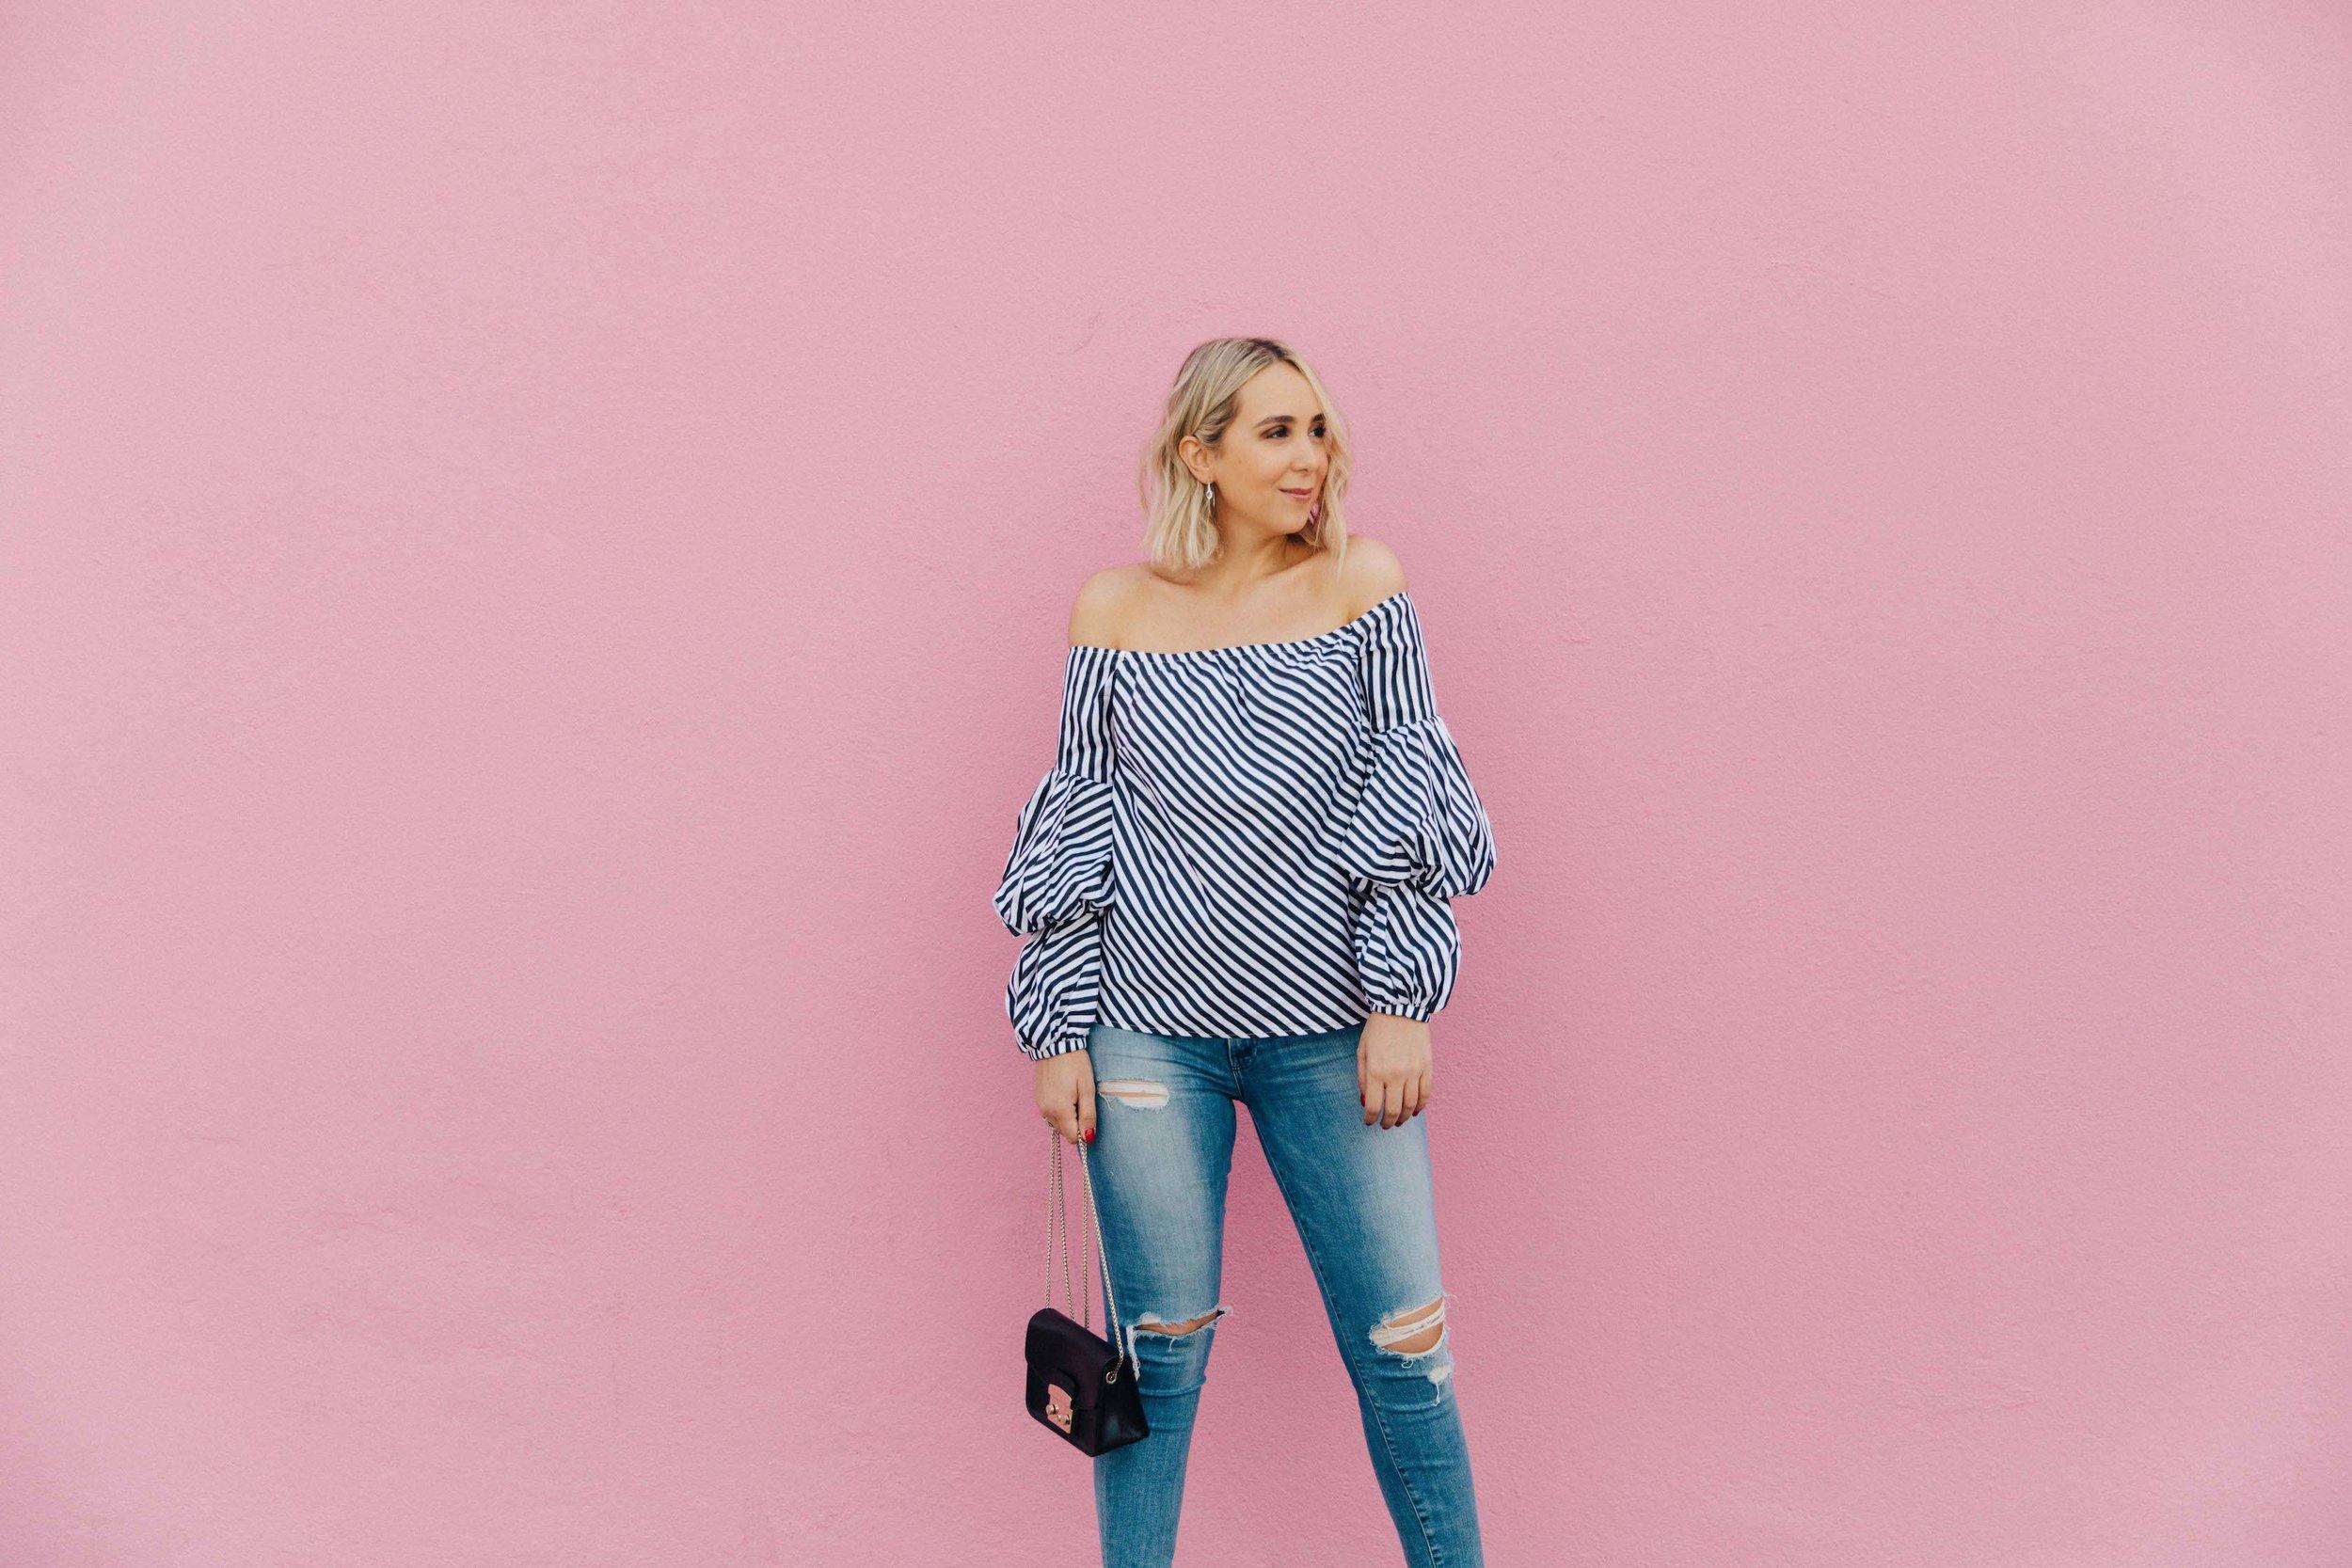 Marina-De-Giovanni-LA-Pink-Wall.jpg